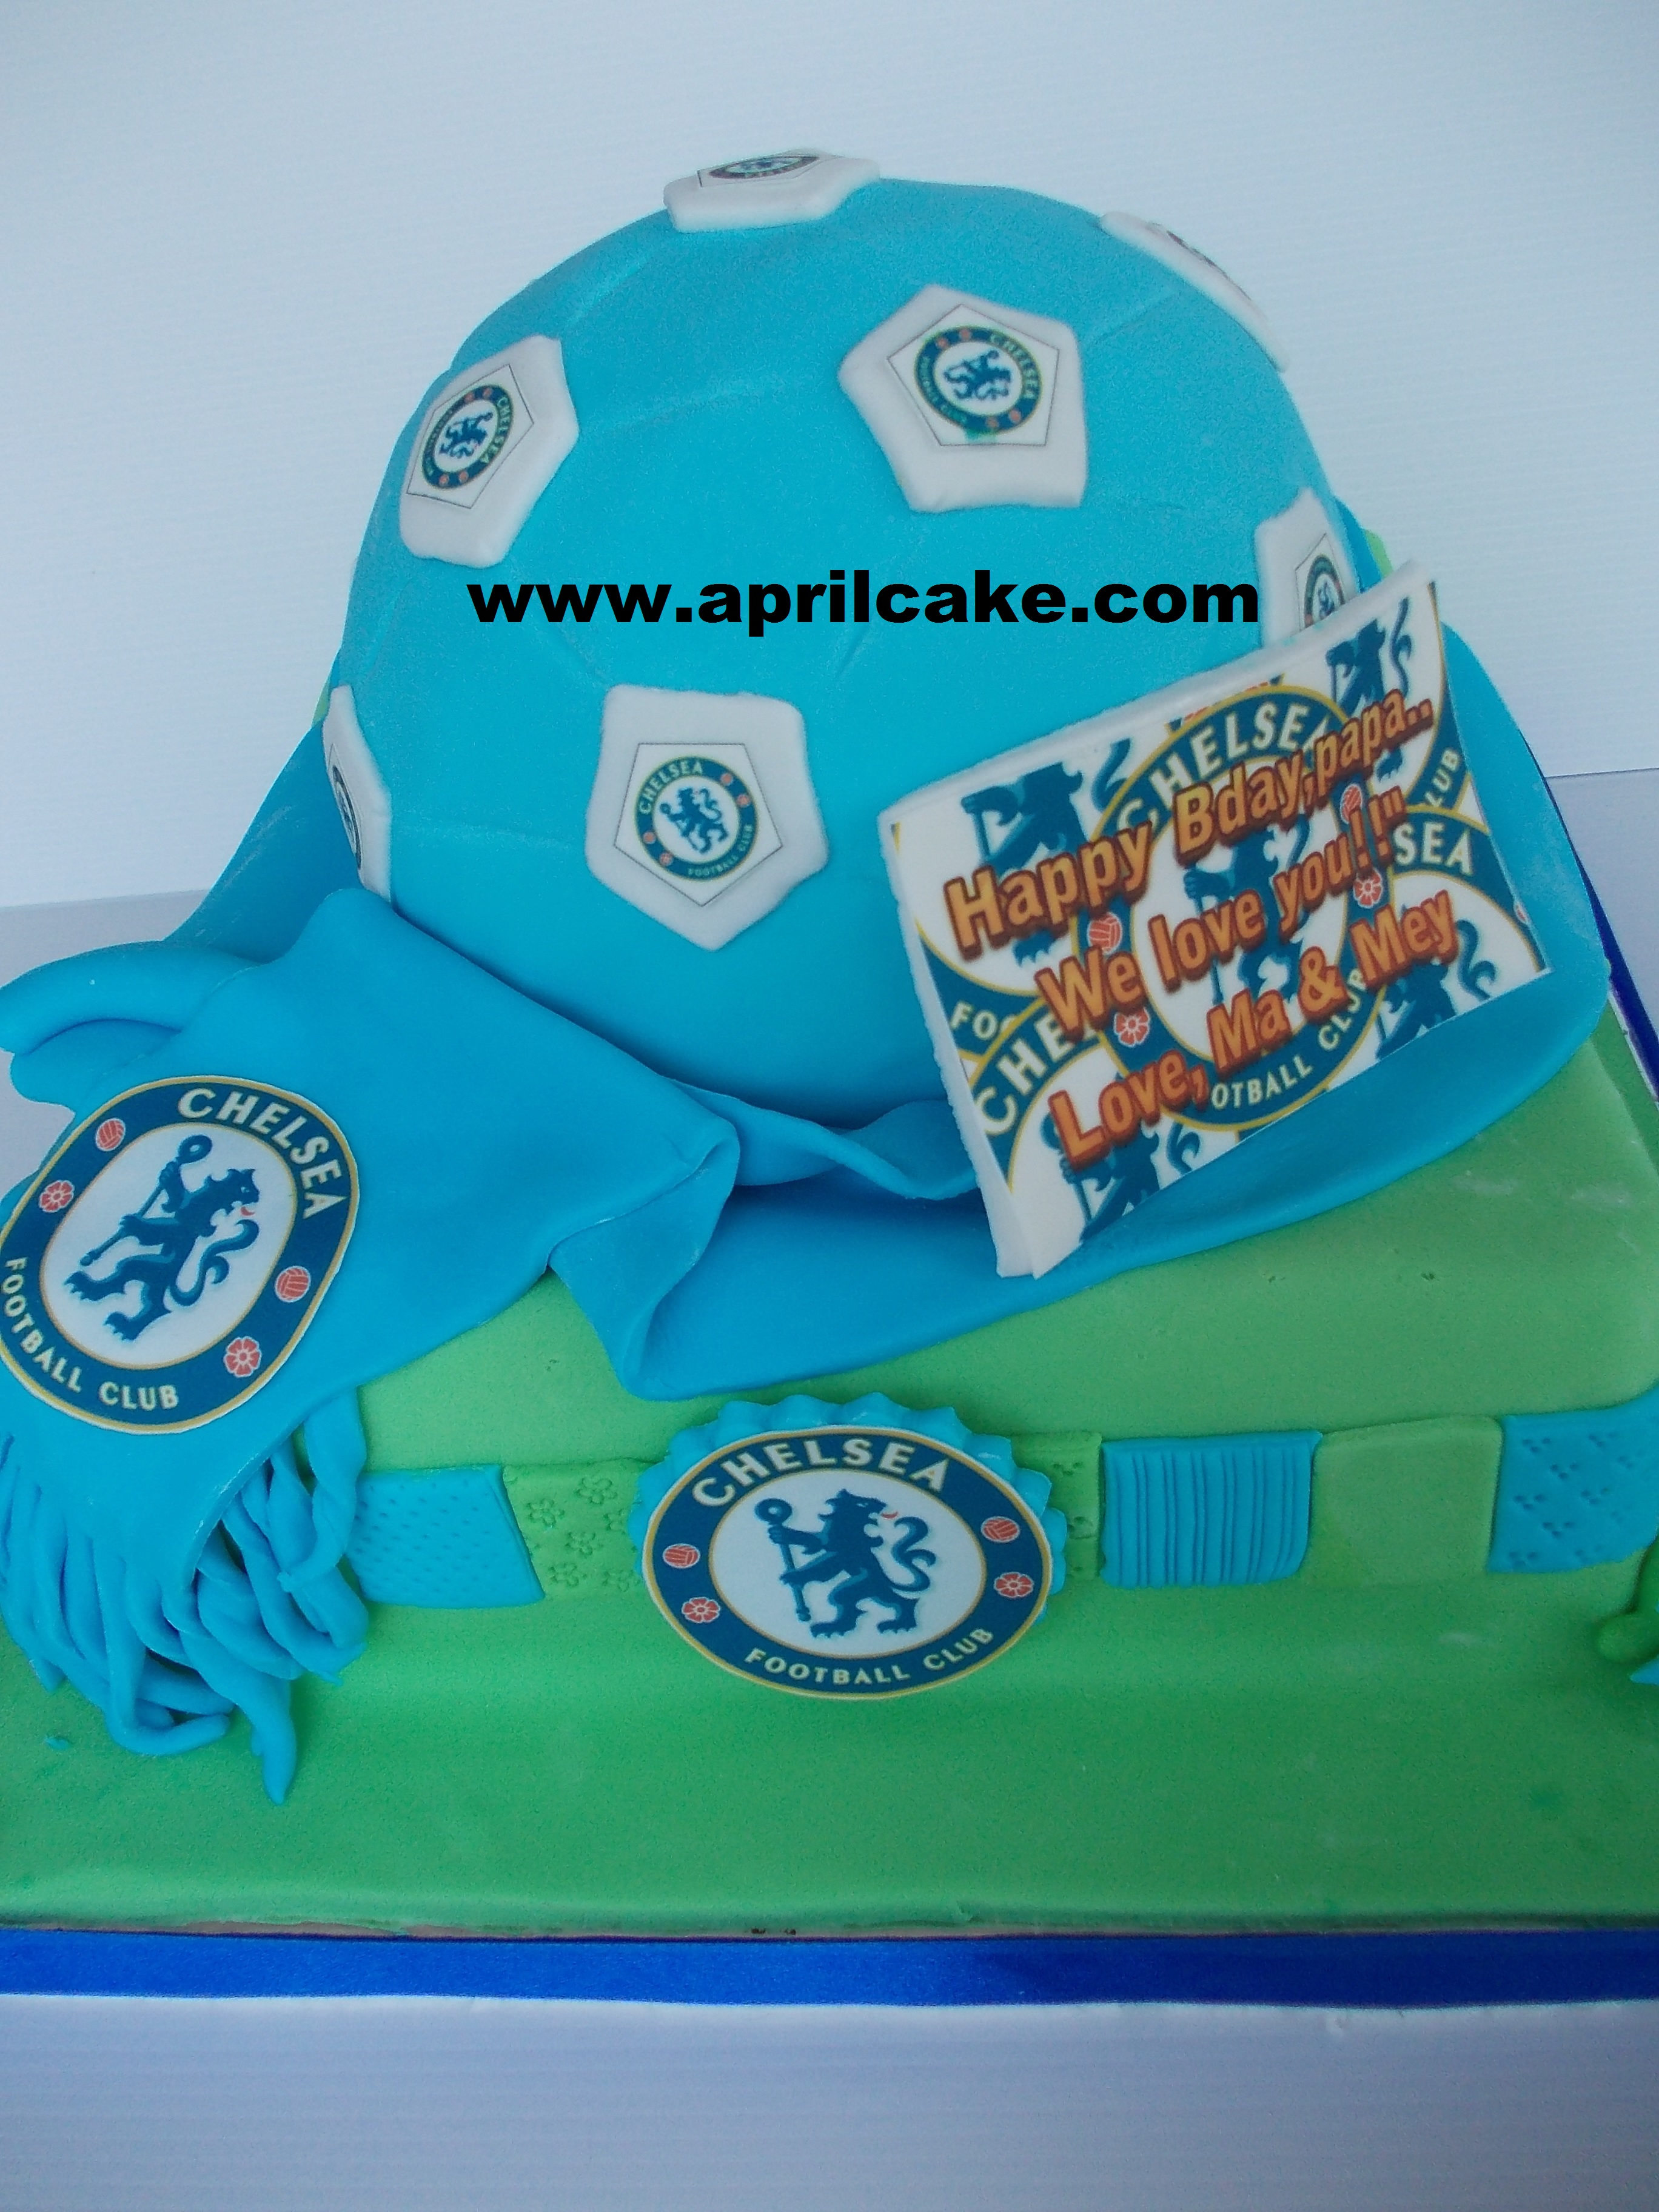 Chelsea Cake Shinta